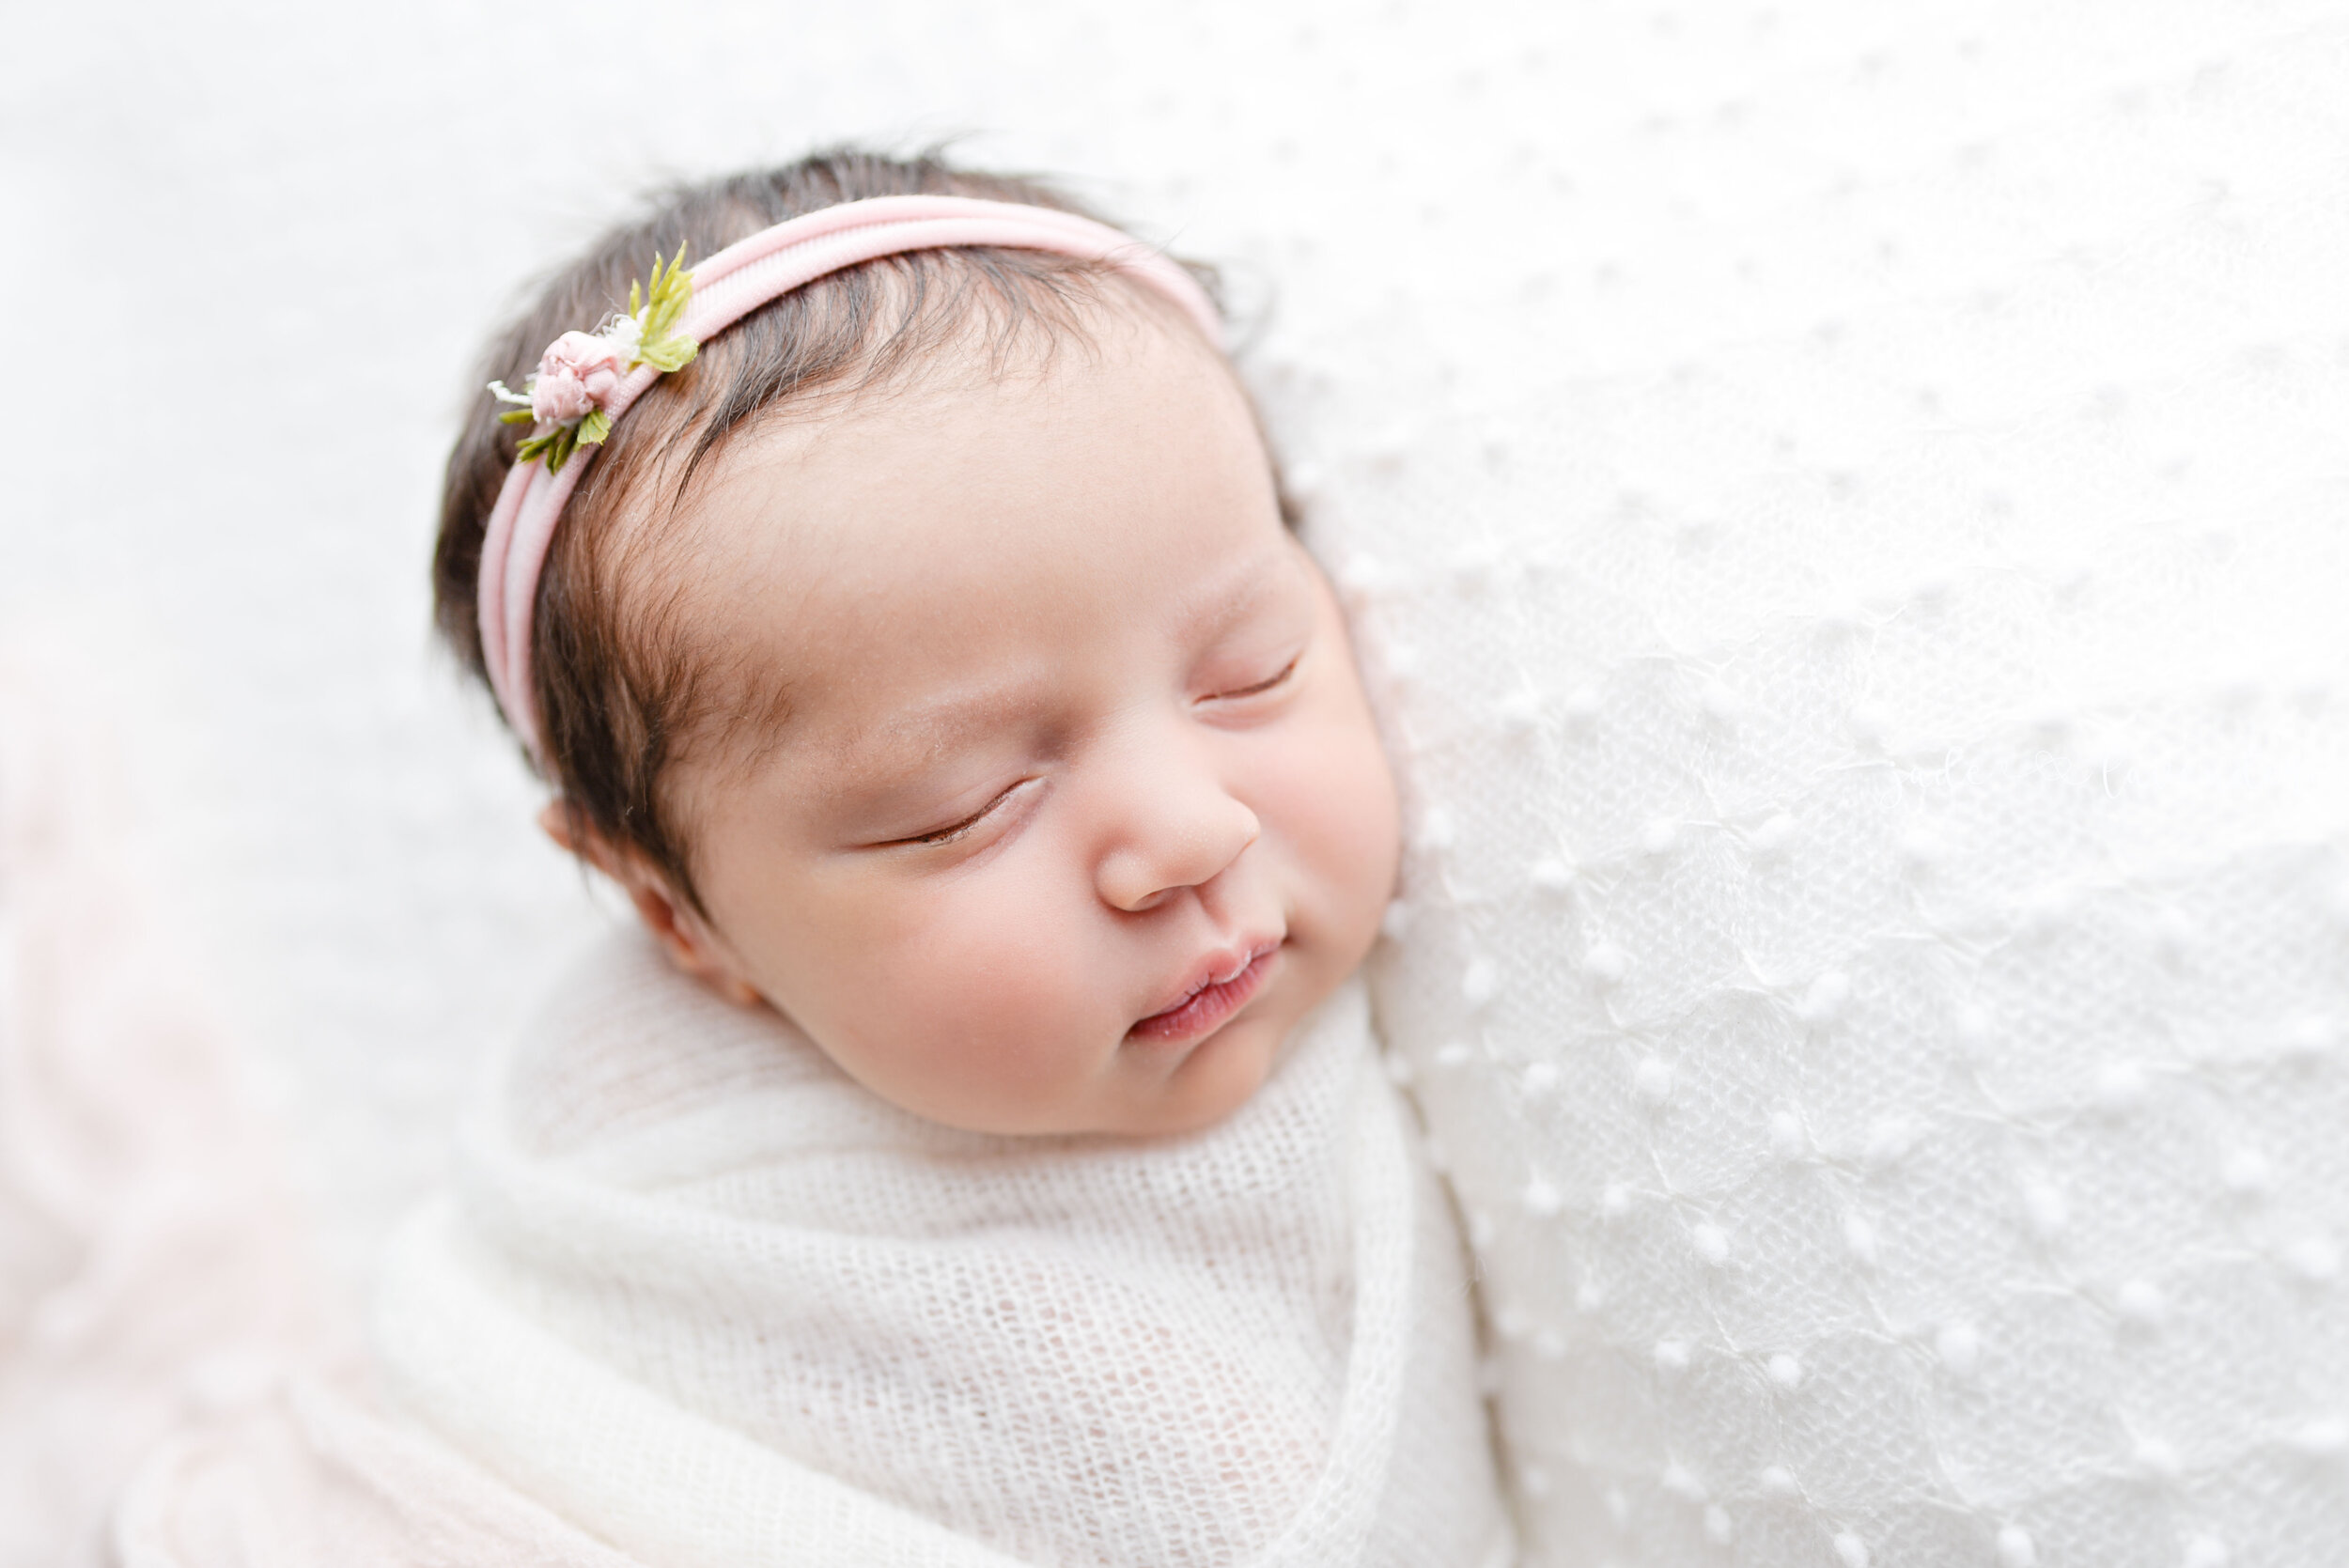 Newborn-images-baby-photography-infant-images-Newborn-photographer-spokane-washington-baby-girl (6 of 11).jpg